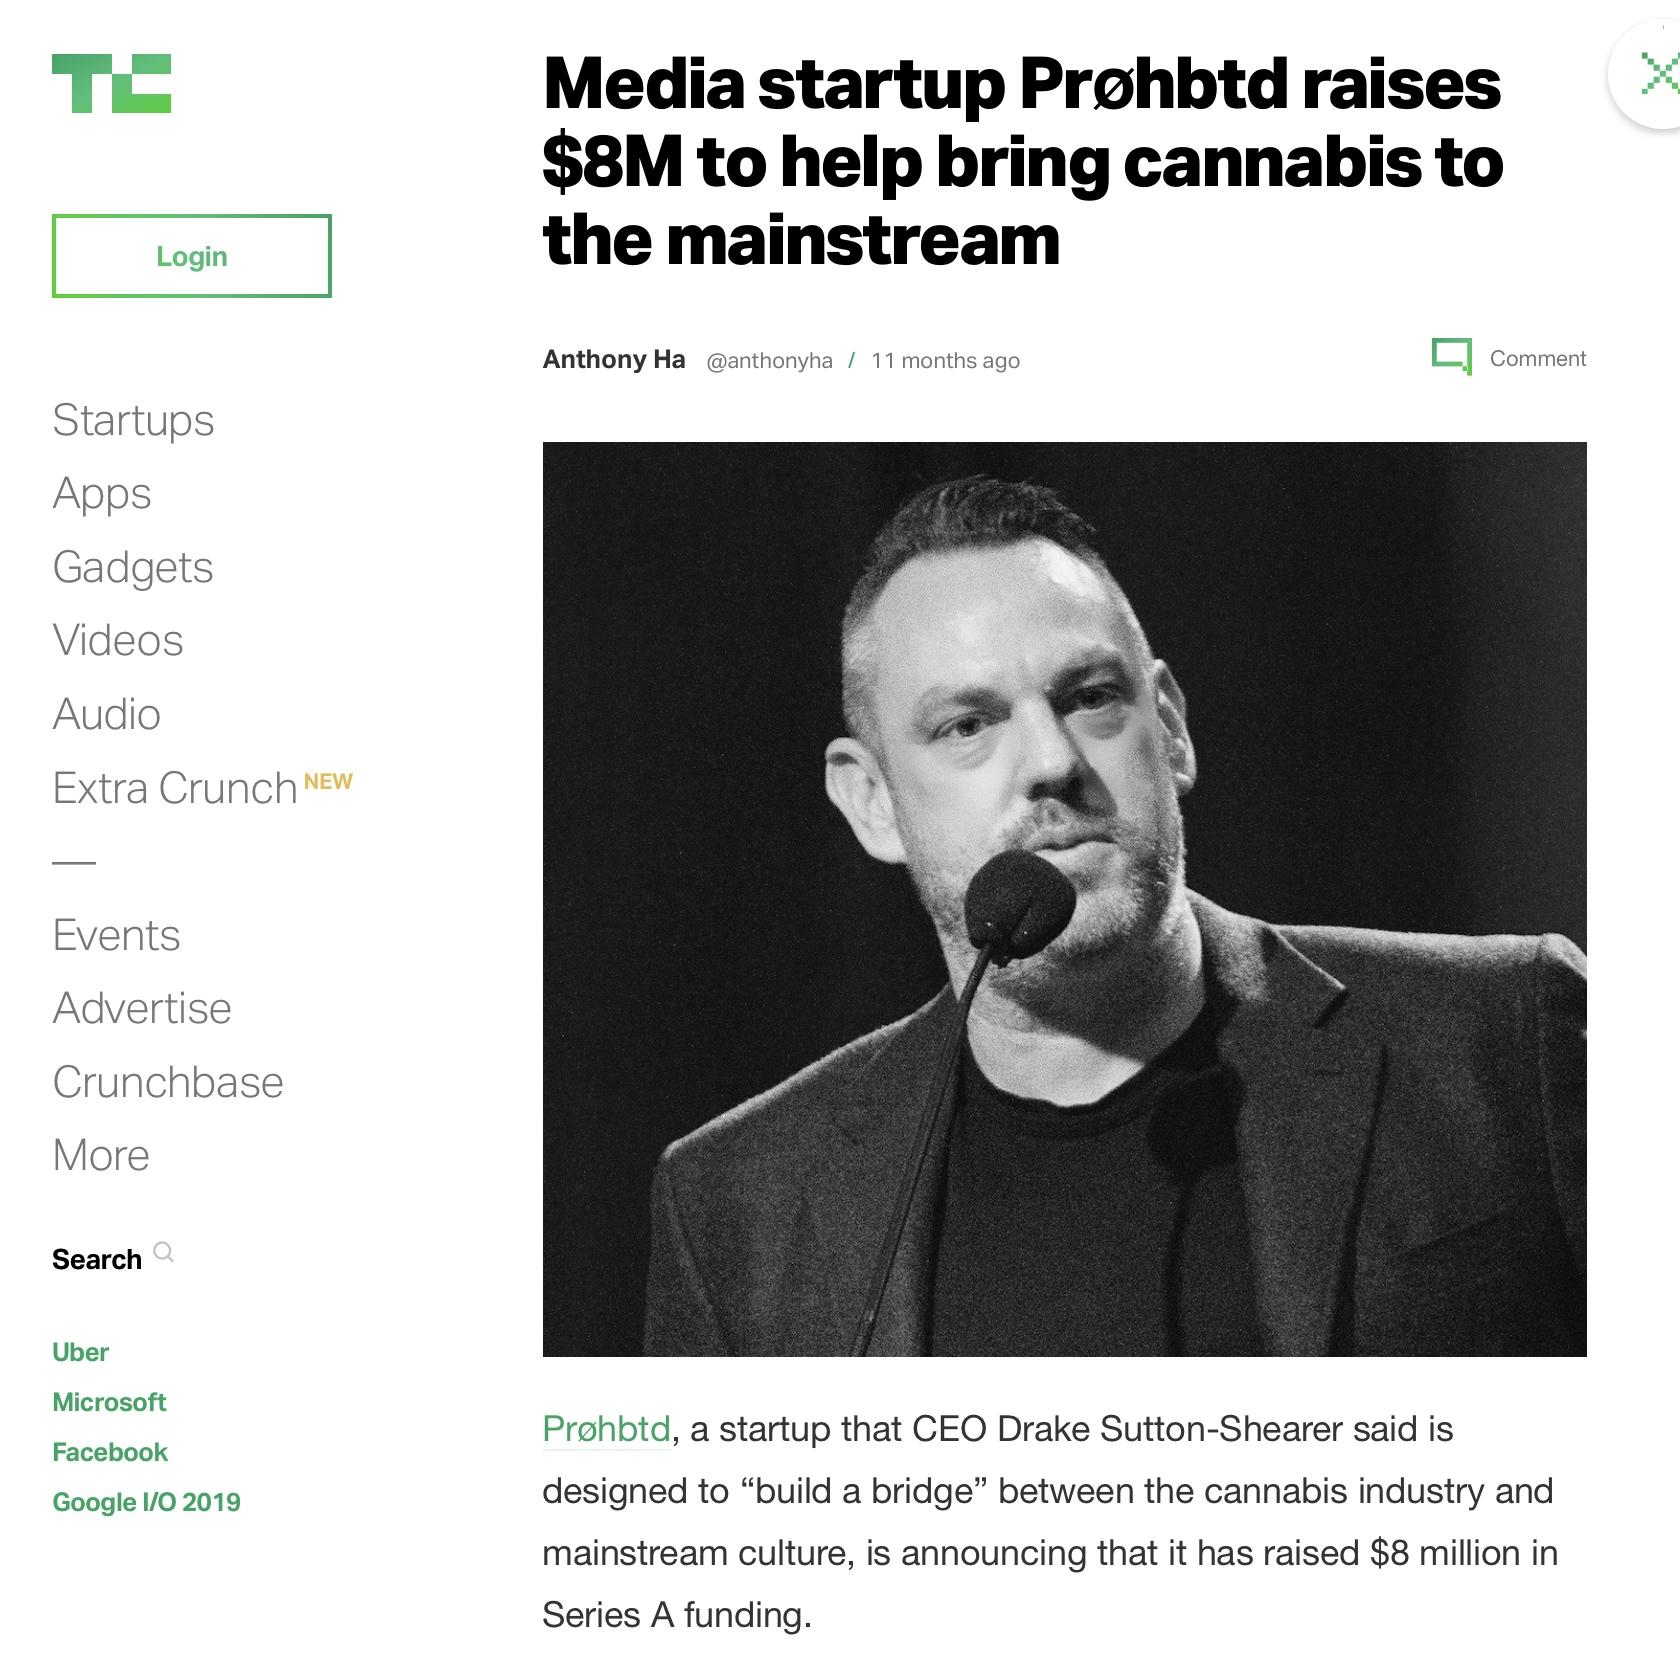 Media startup Prøhbtd raises $8M to help bring cannabis to the mainstream -